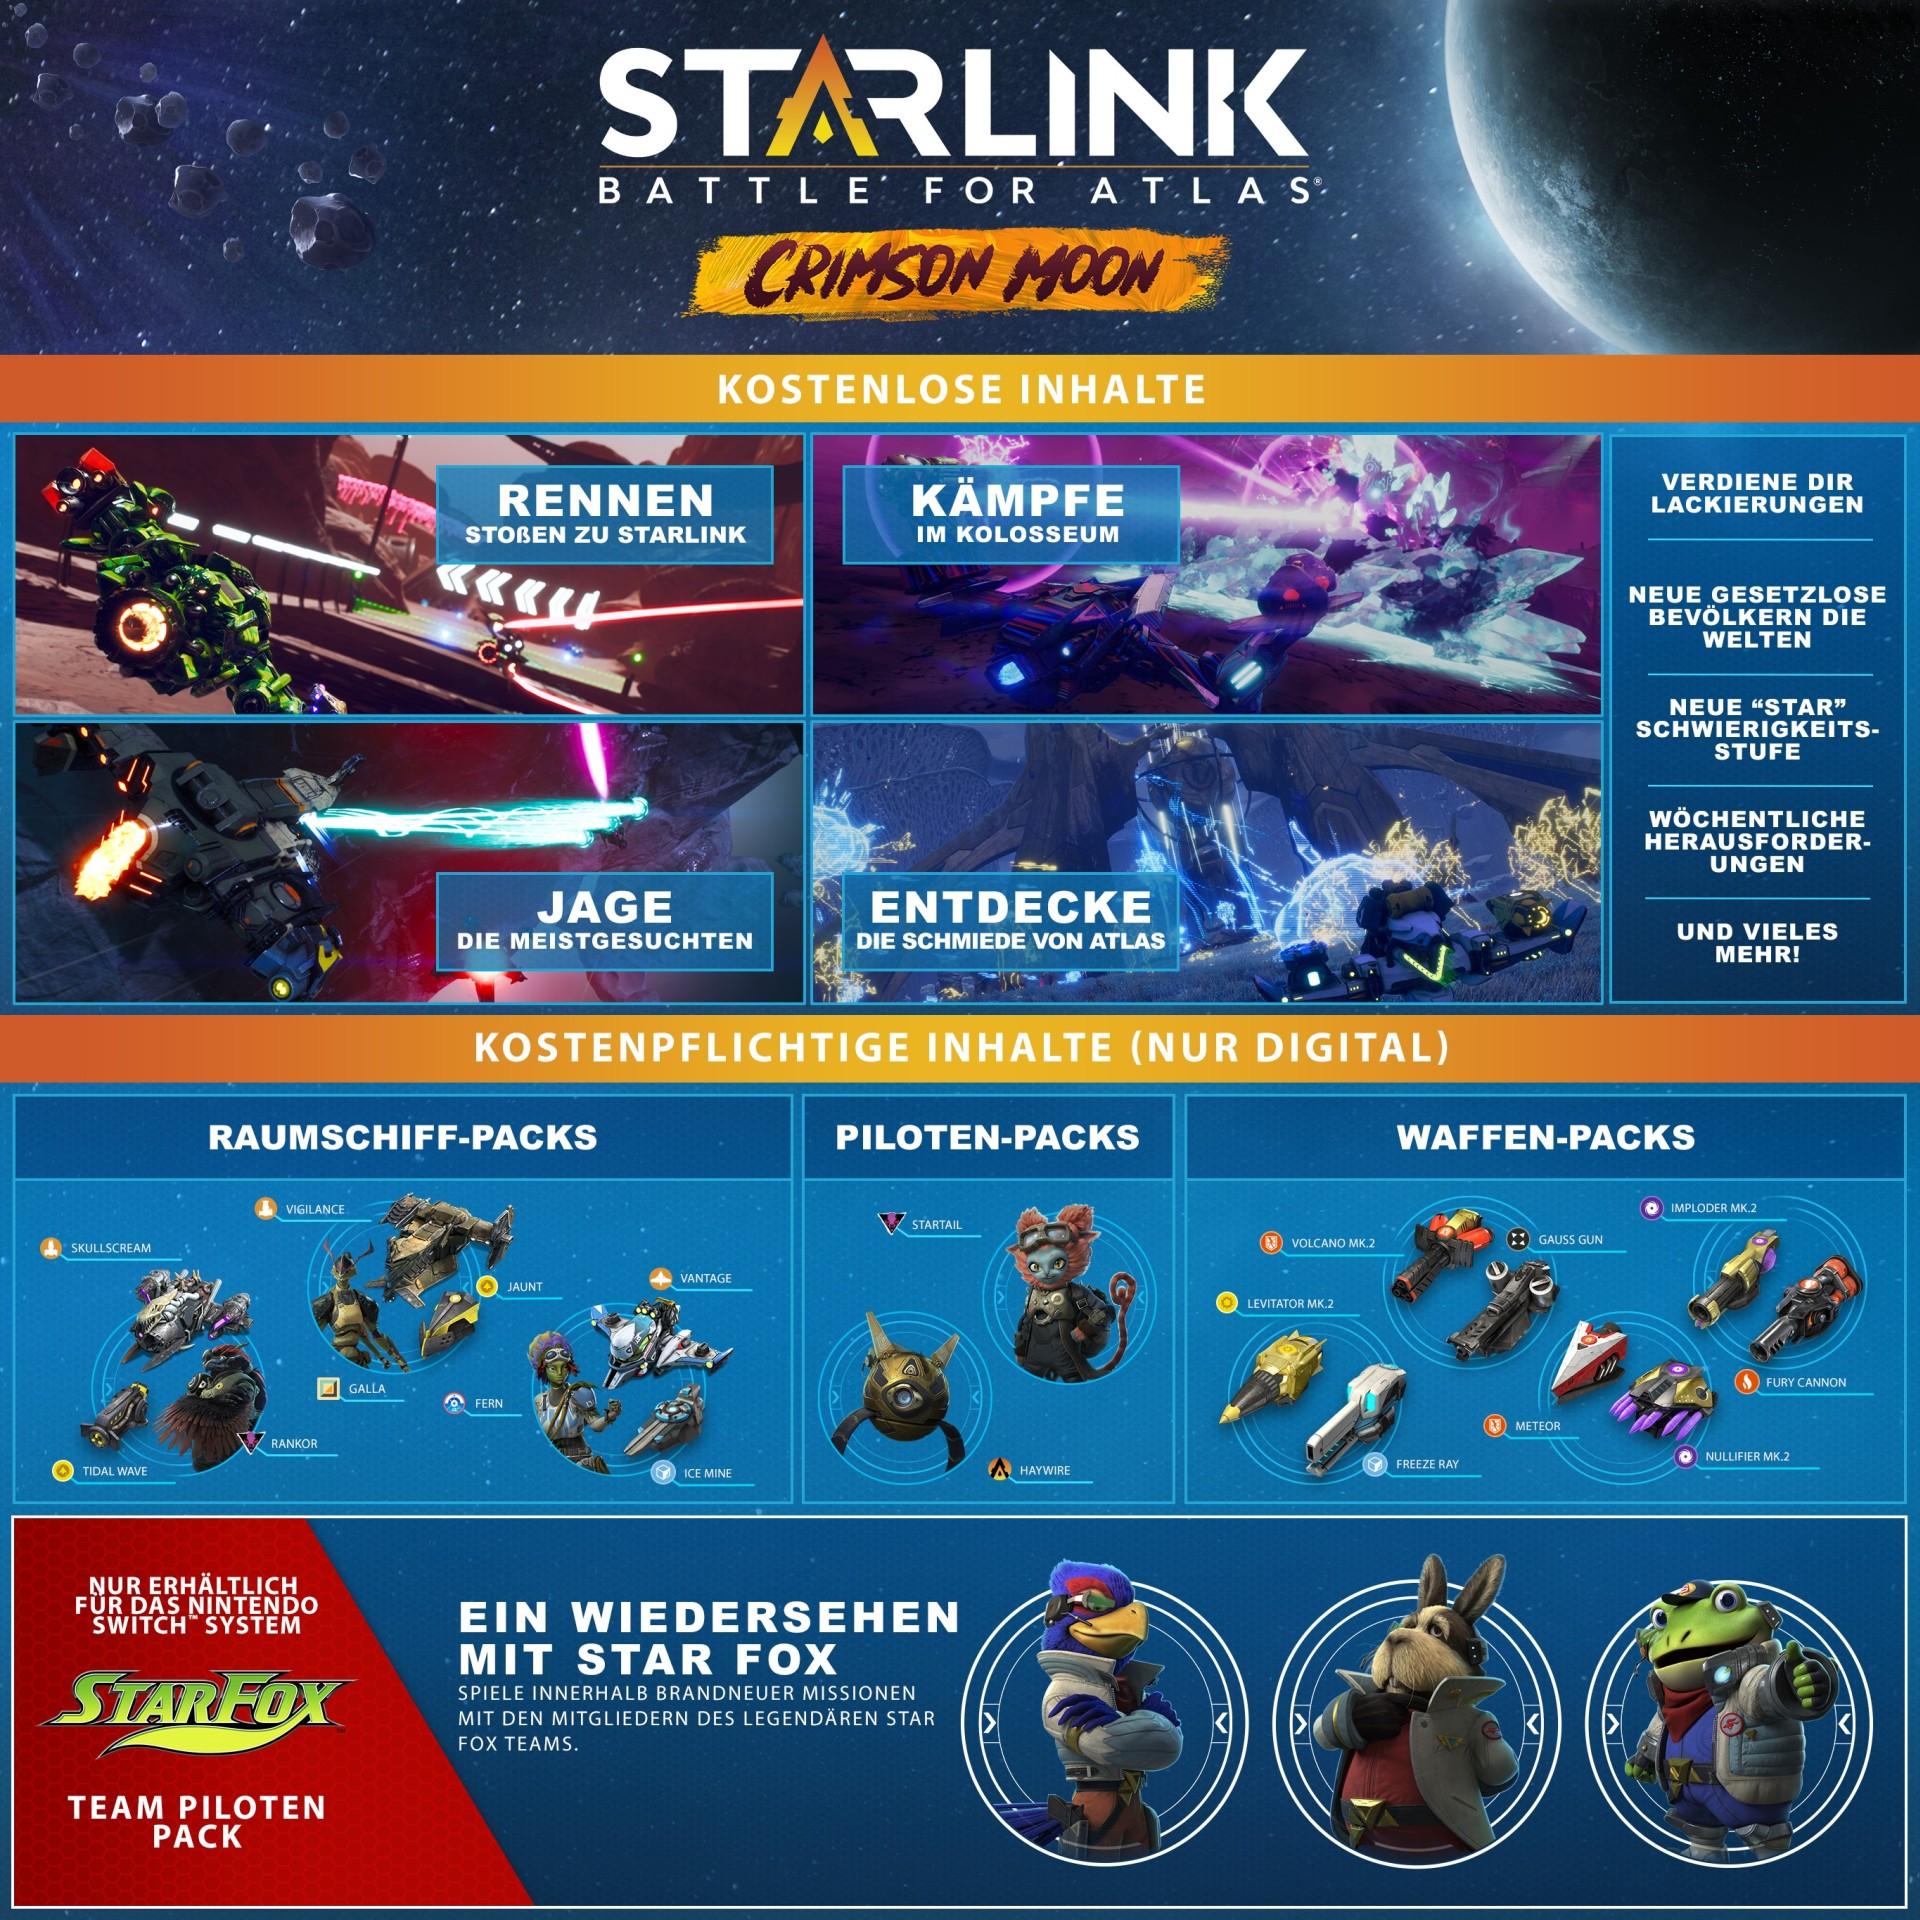 Starlink Battle for Atlas Das Crimson Moon-Updat (1)